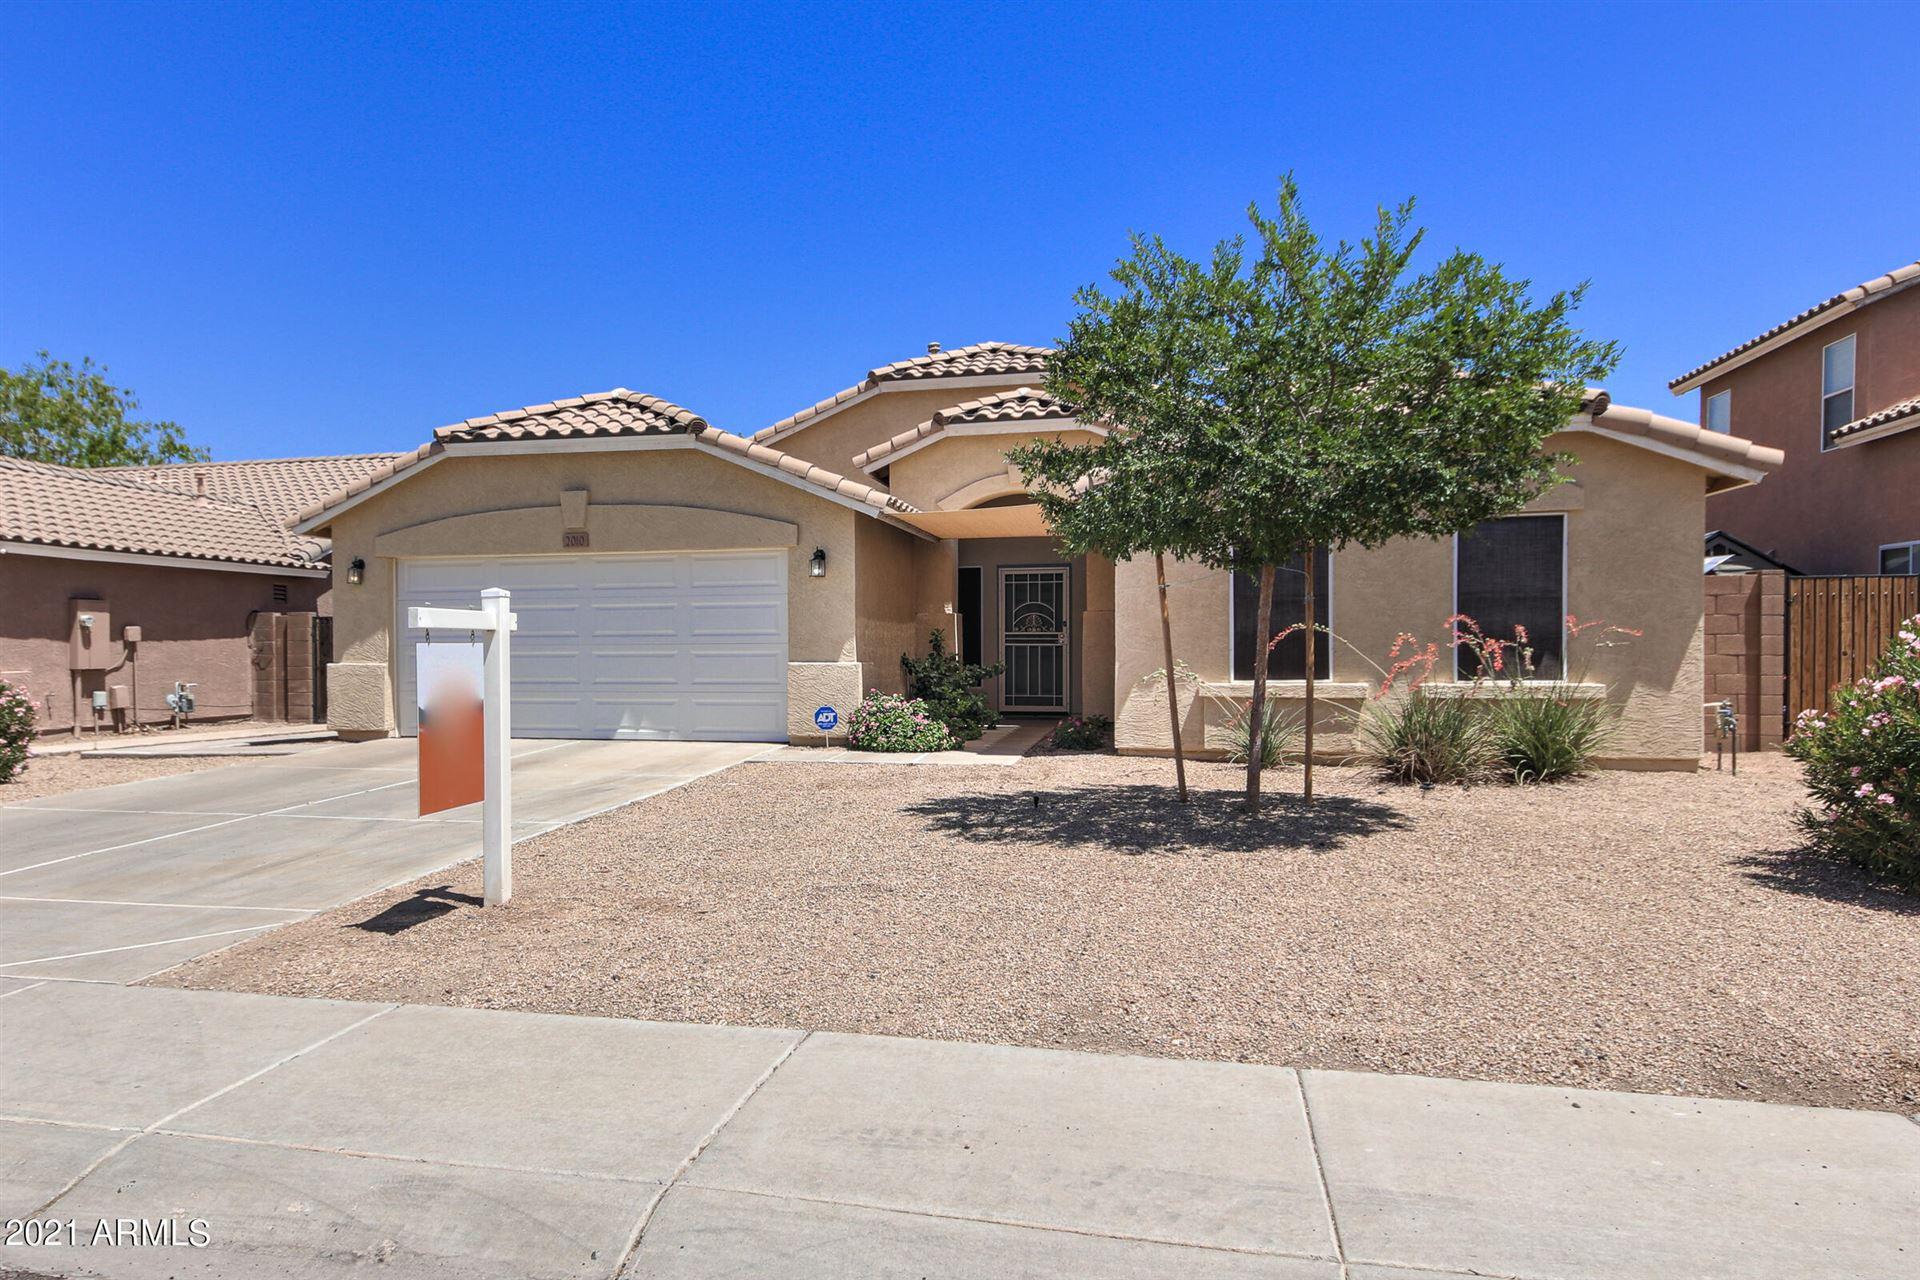 Photo of 2010 W ALTA VISTA Road, Phoenix, AZ 85041 (MLS # 6248582)